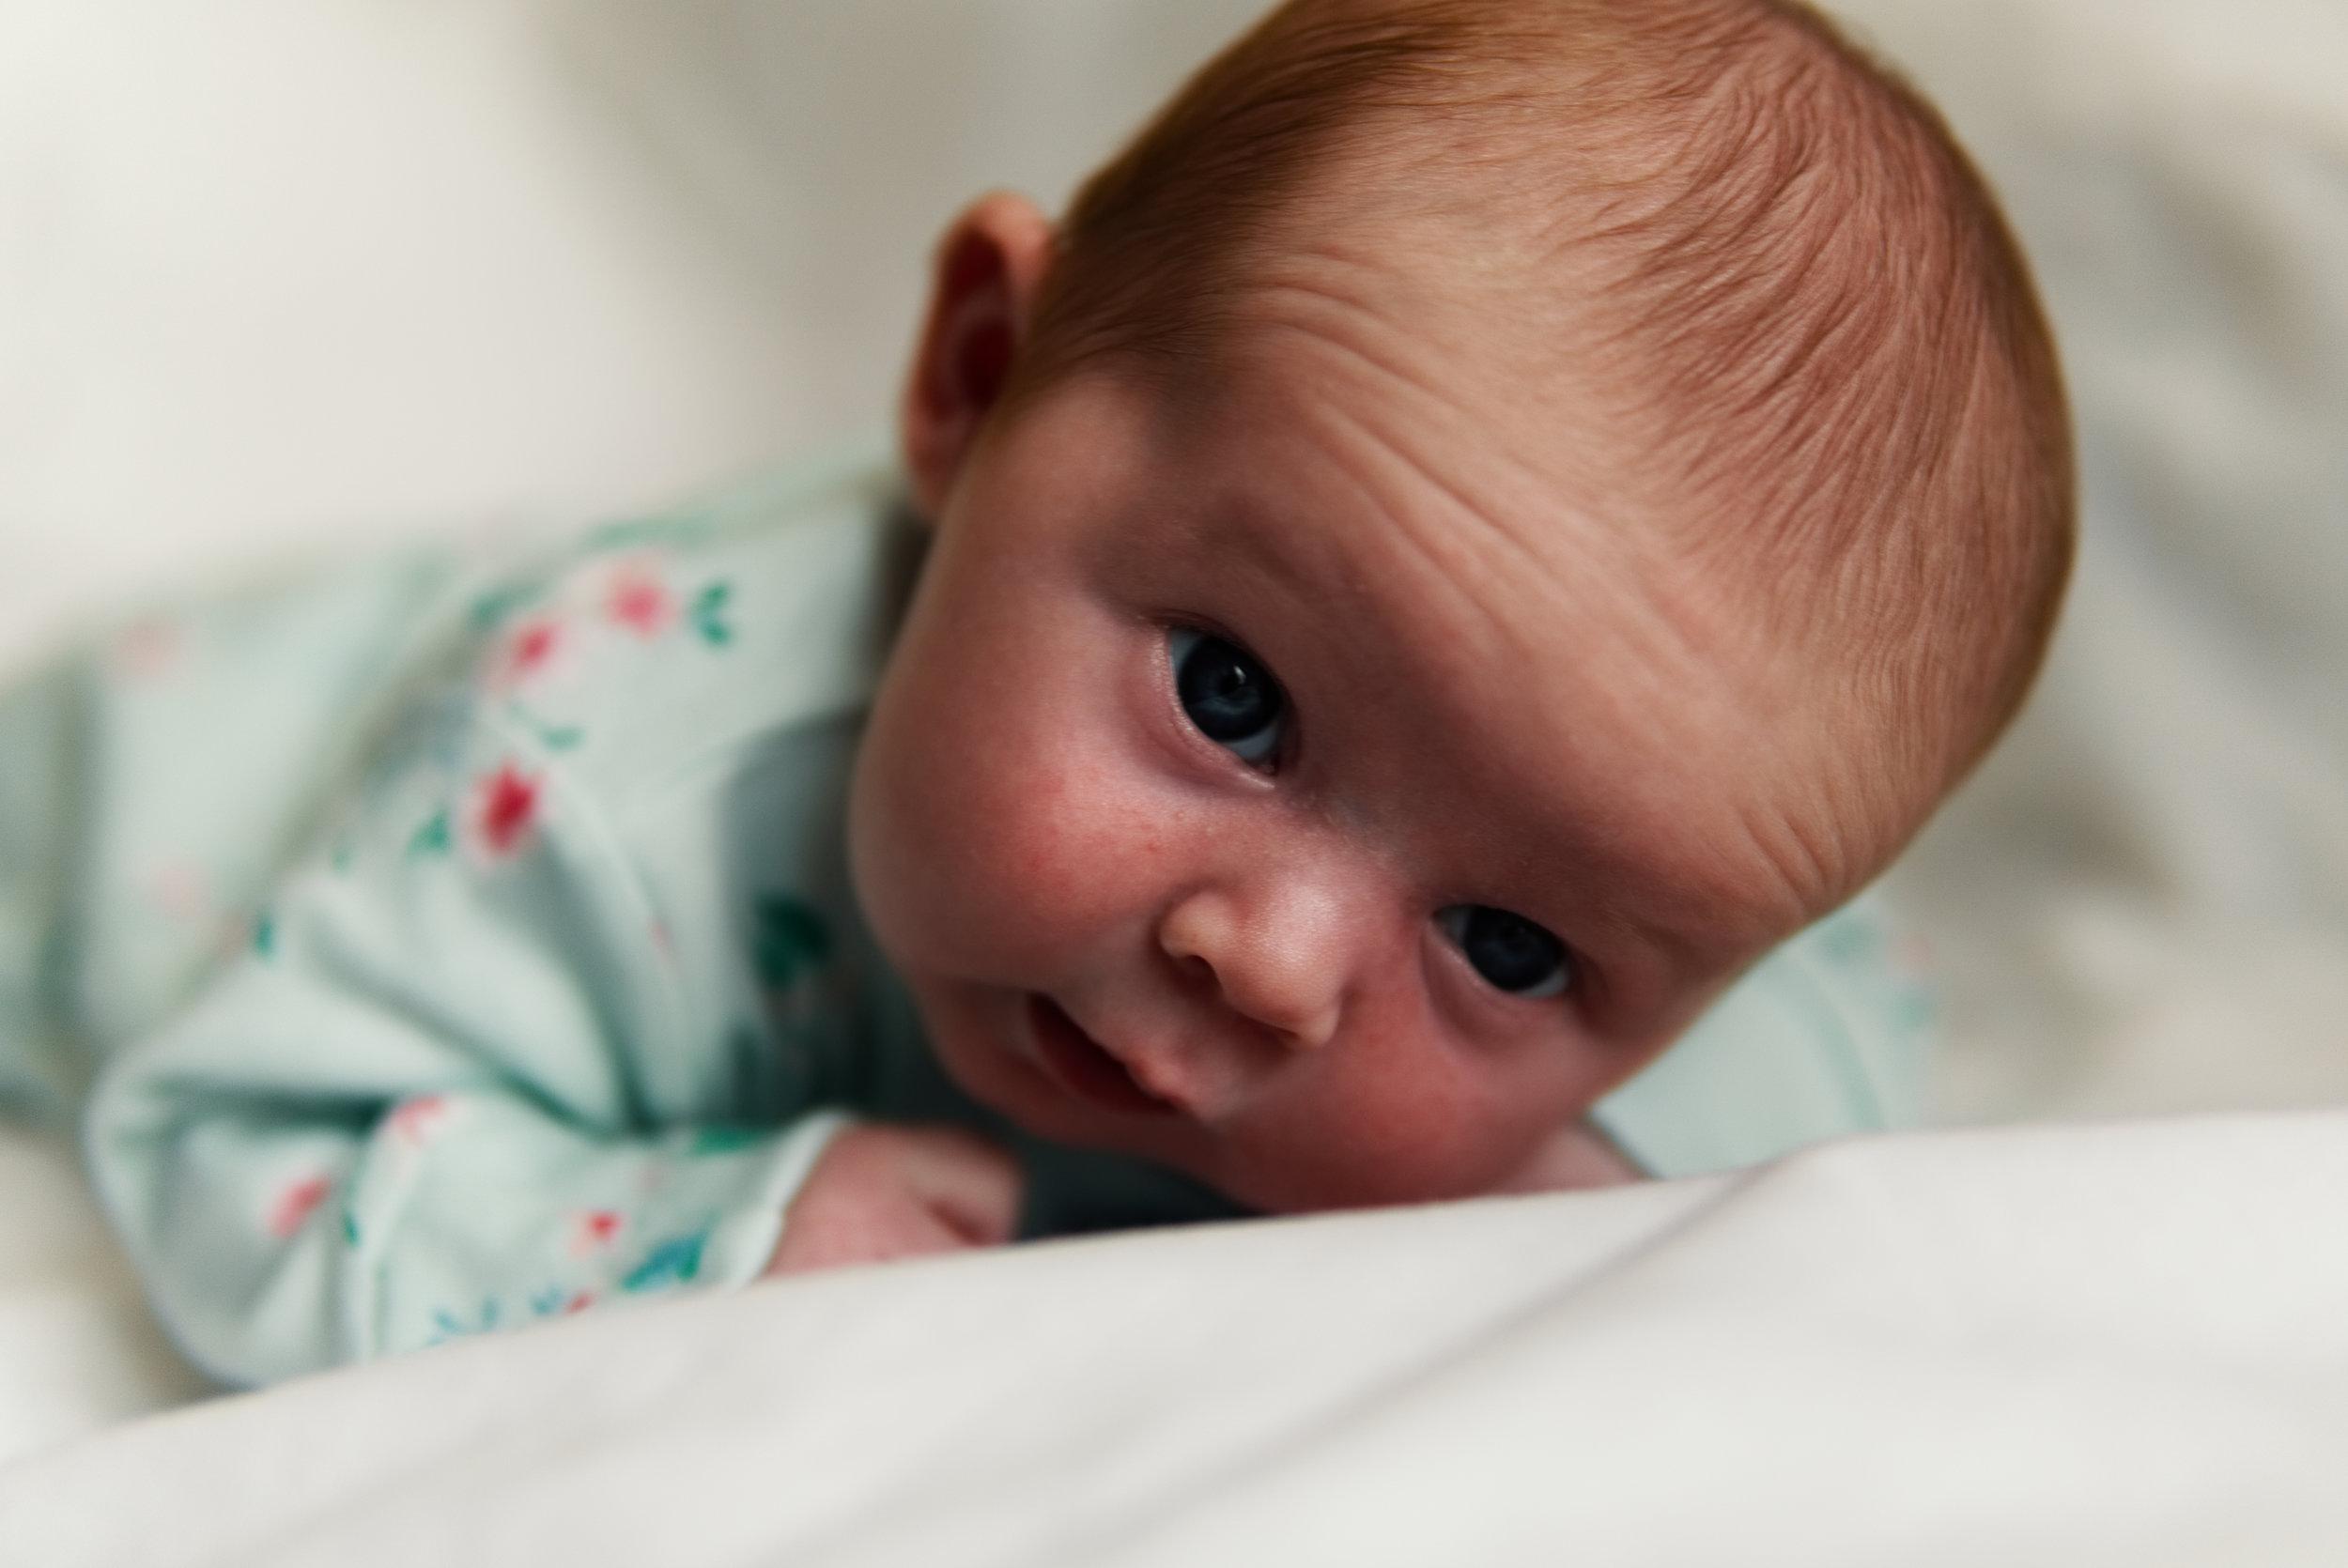 Copy of Newborn Photography by Luke Batchelor Productions